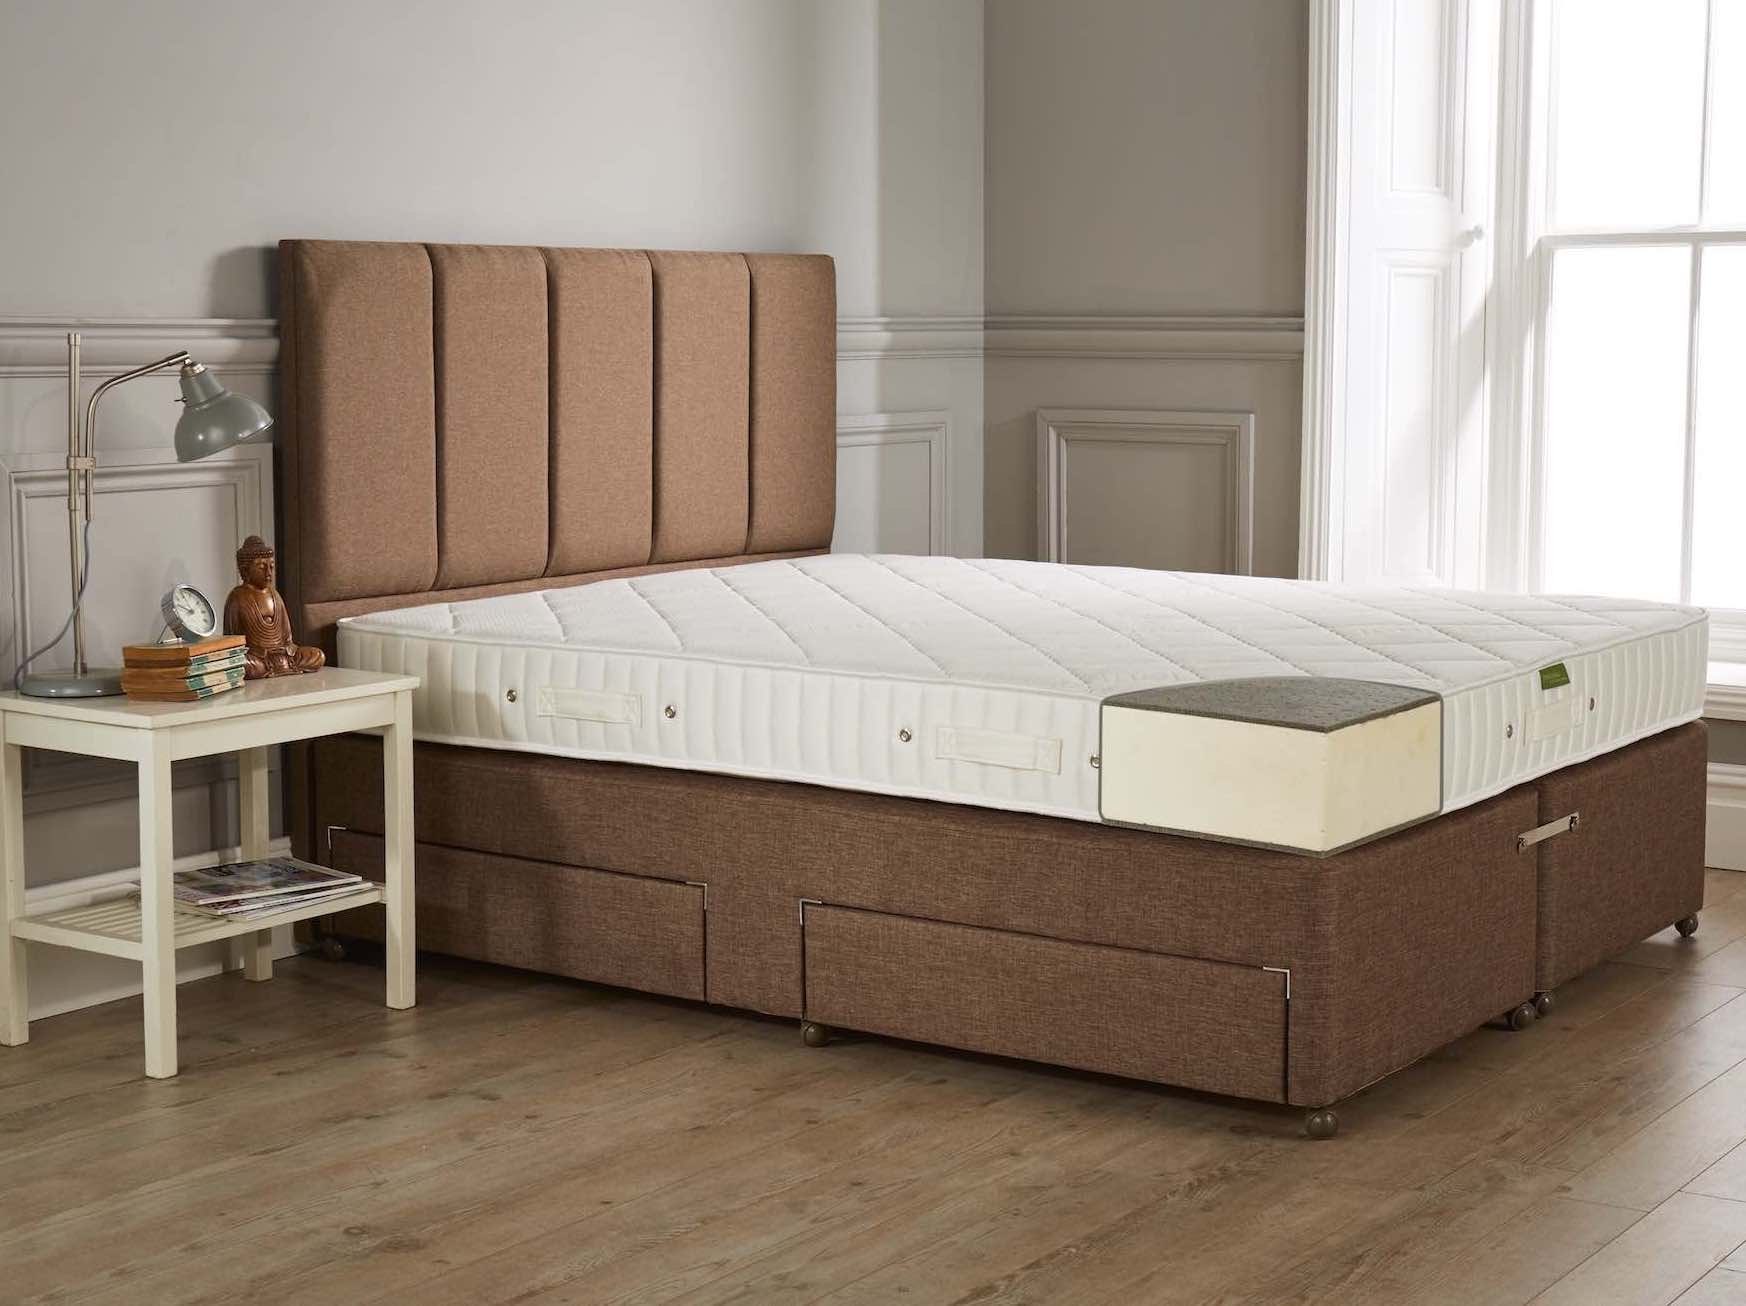 A solid core latex mattress